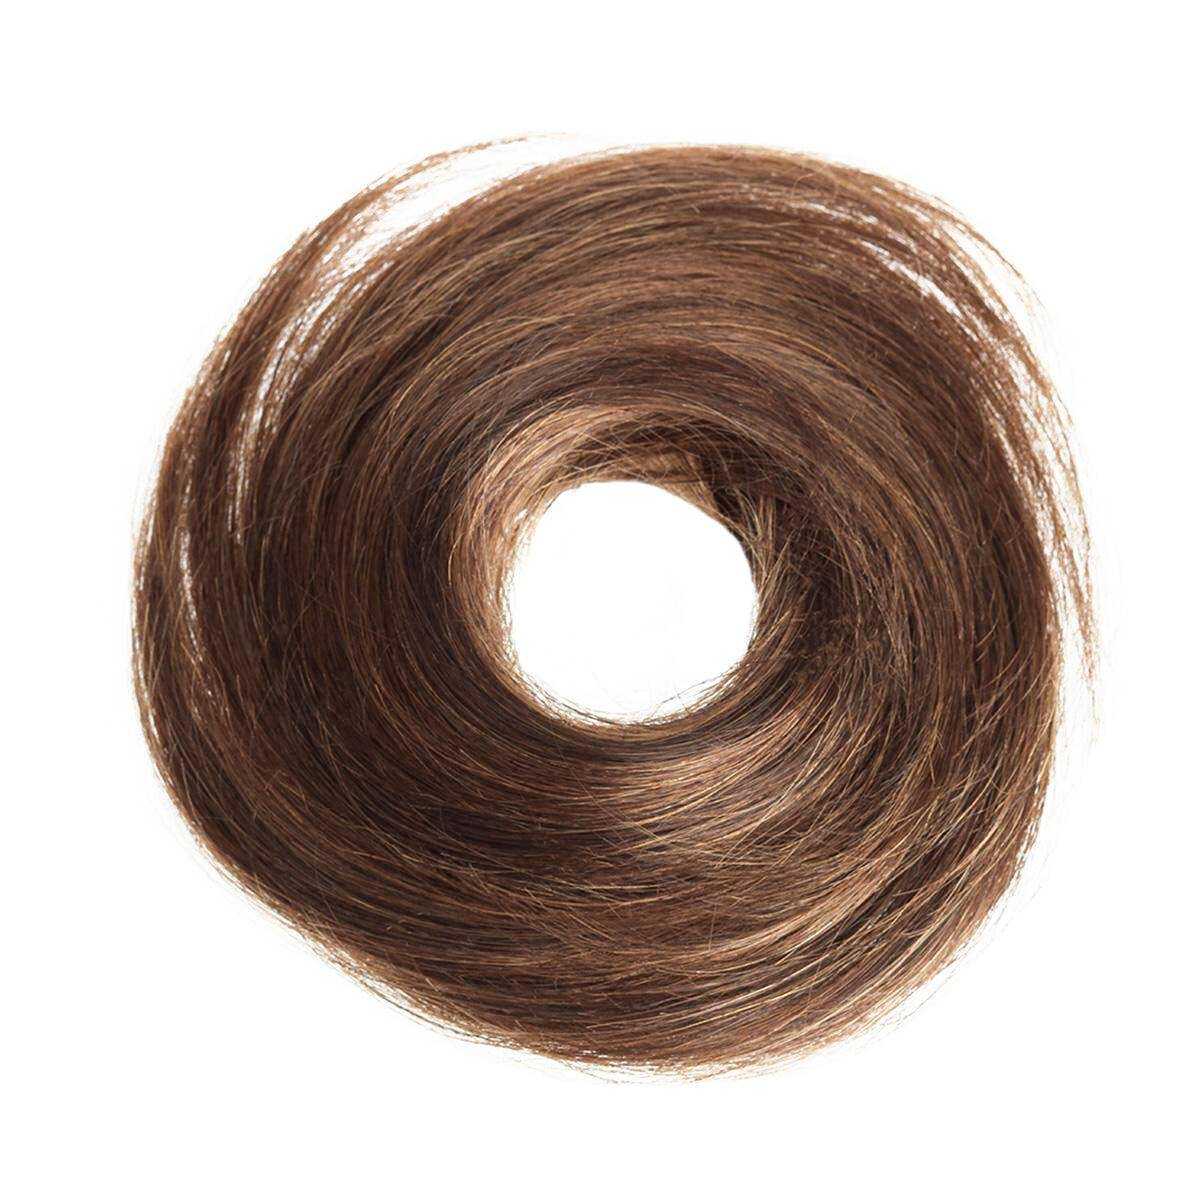 Image of Rapunzel® Aidot hiustenpidennykset Hair Scrunchie Original 20 g M2.3/5.0 Chocolate Mix 0 cm